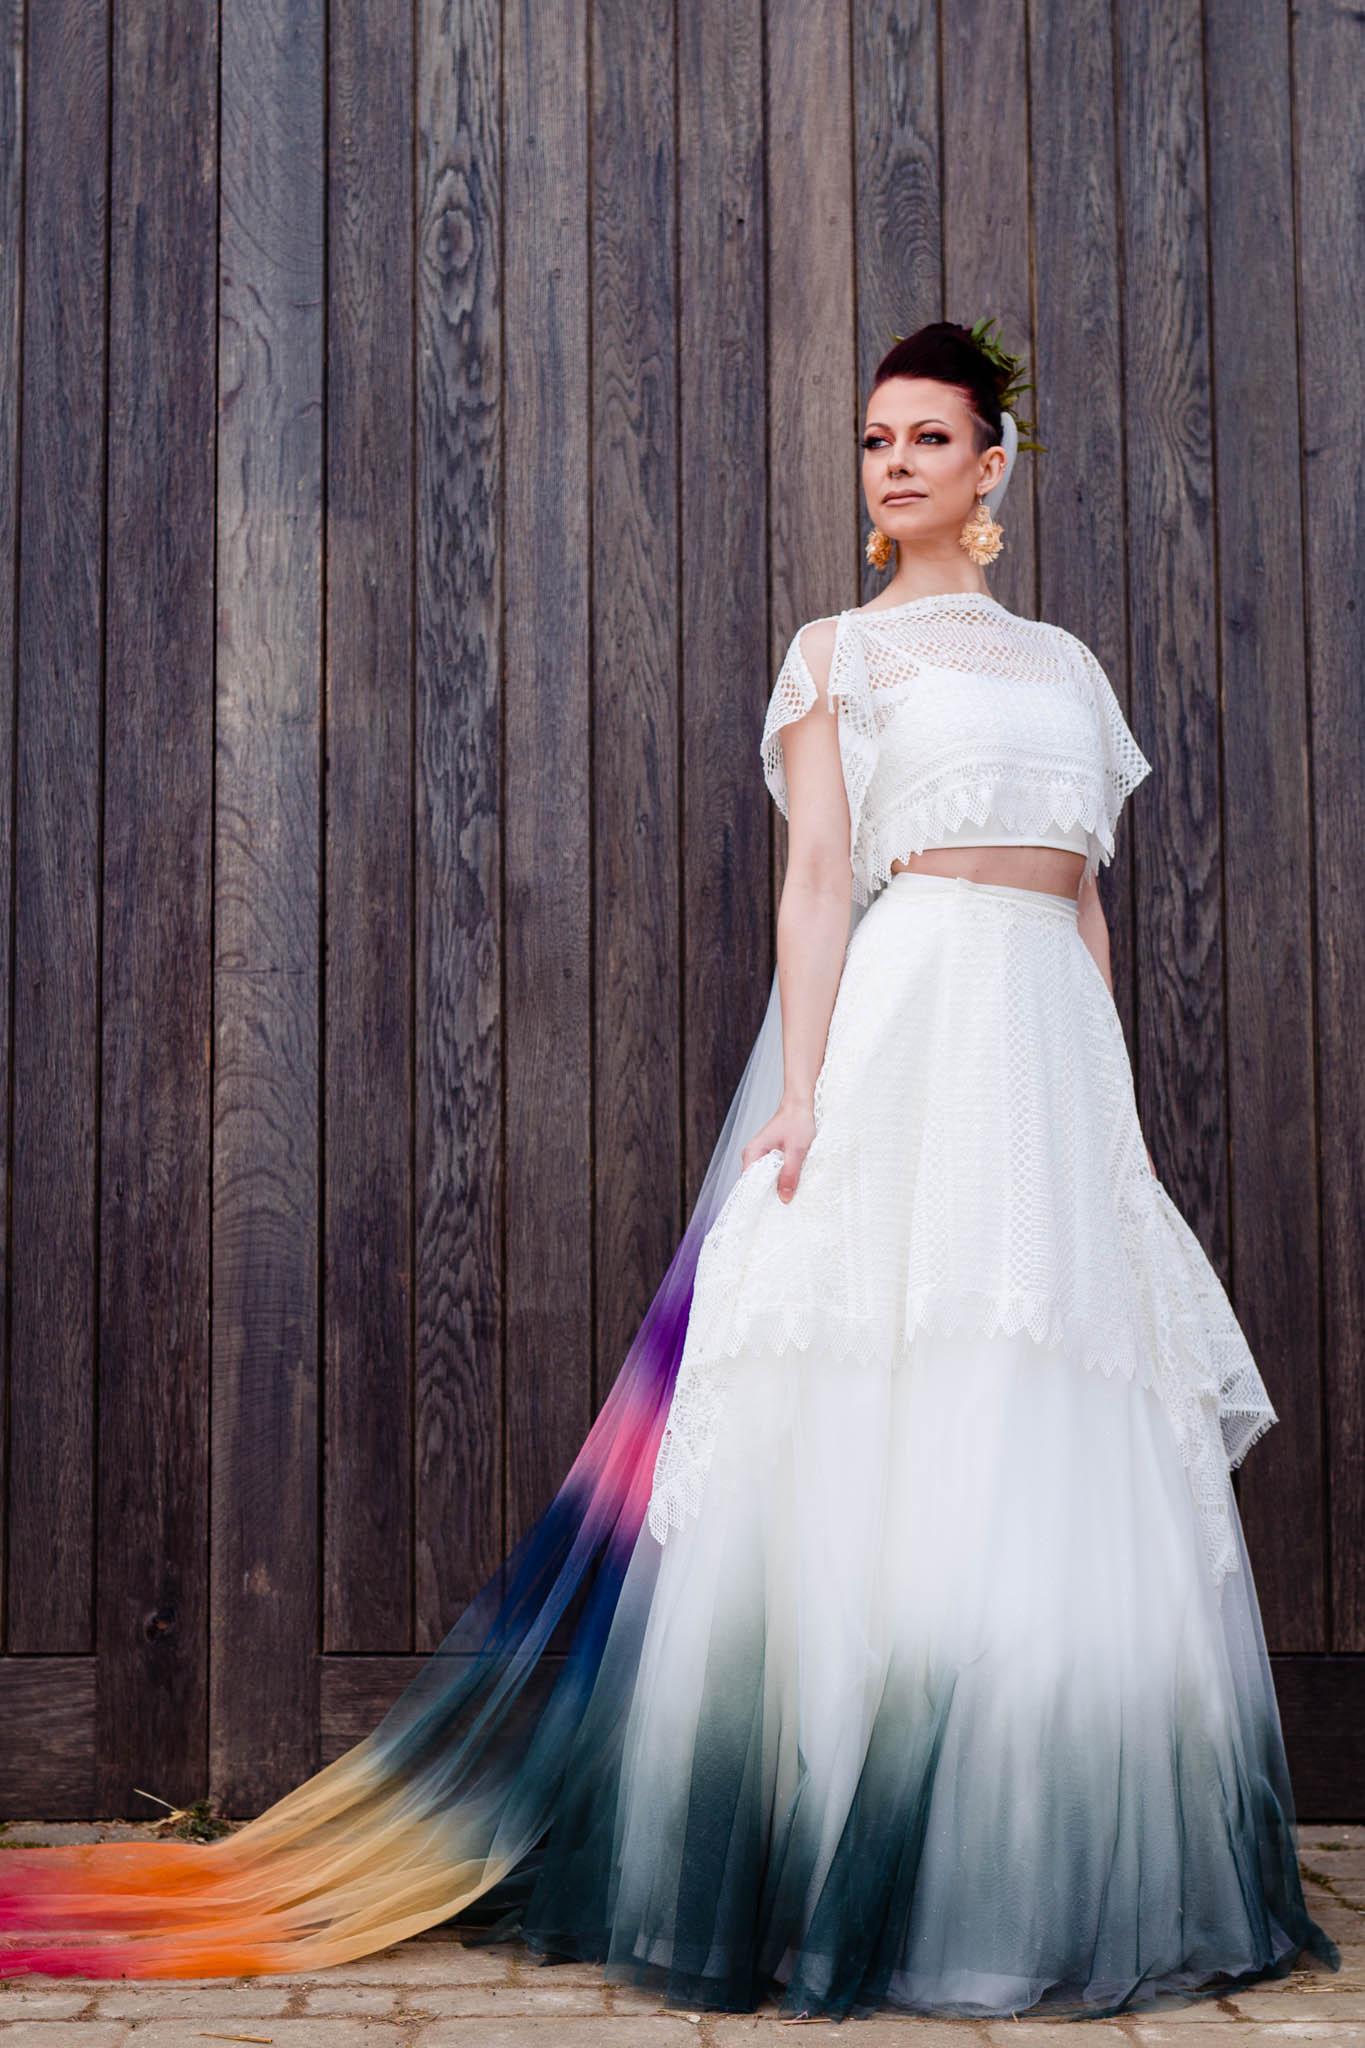 ombre bridal veil - ombre wedding dress - modern bridal wear - modern tropical wedding - modern wedding - modern bride - east midlands wedding planner